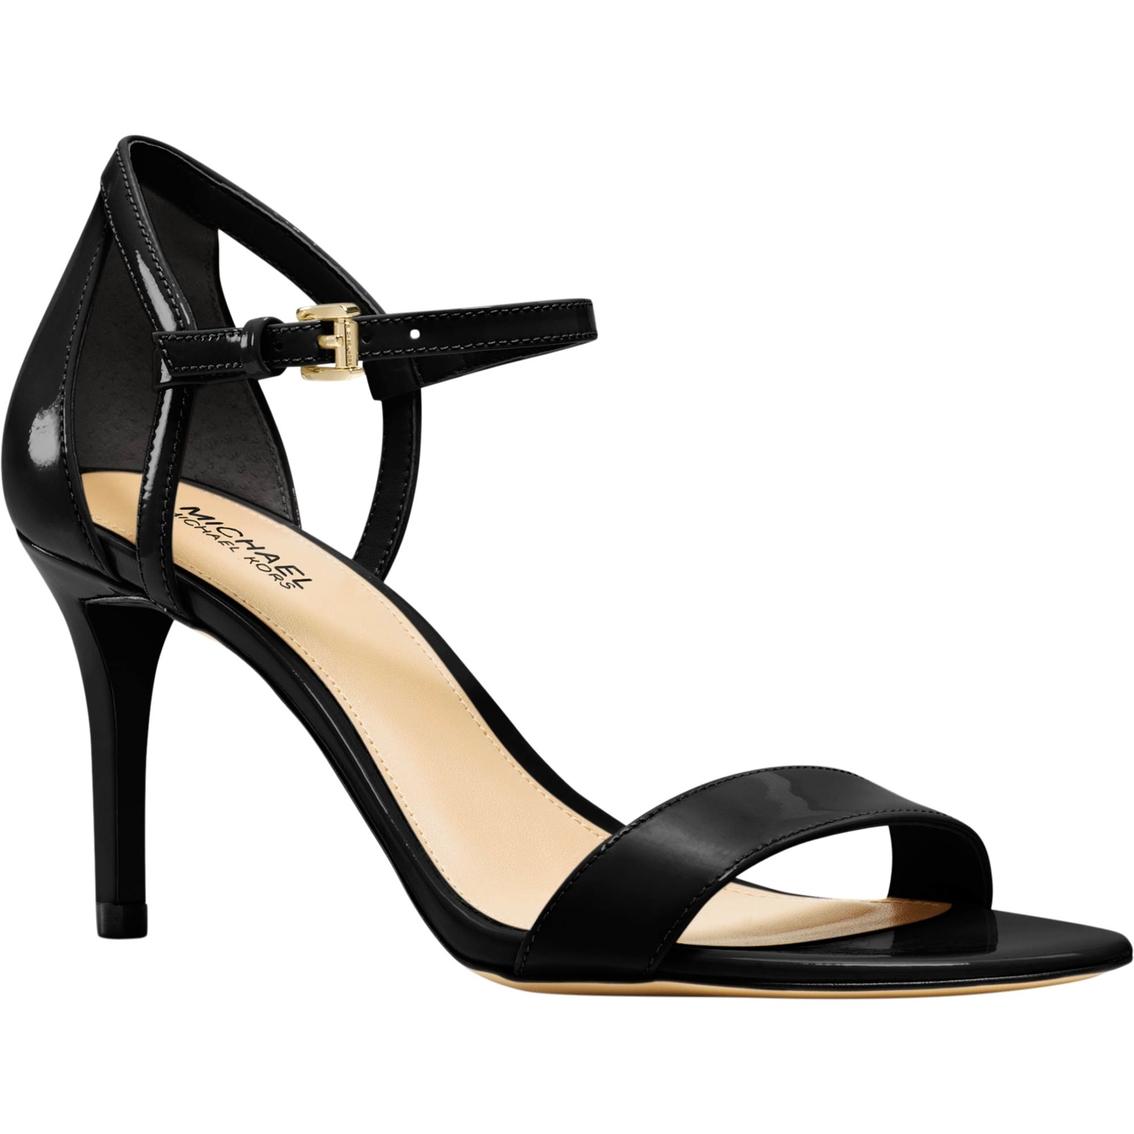 31e6264ba7d6 Michael Kors Simone Mid Dress Sandals